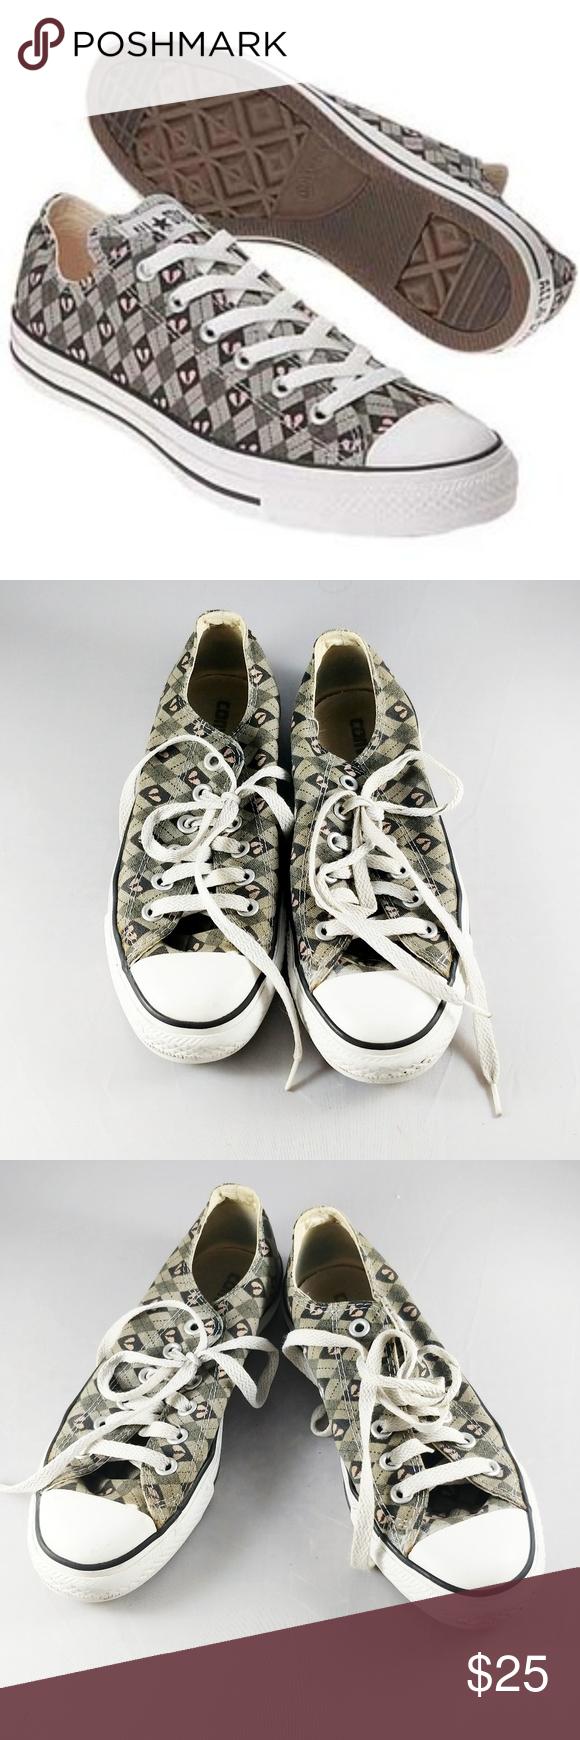 9c9816985850ec Converse all star broken heart low top sneakers BRAND  Converse SIZE  W 7  FLAW